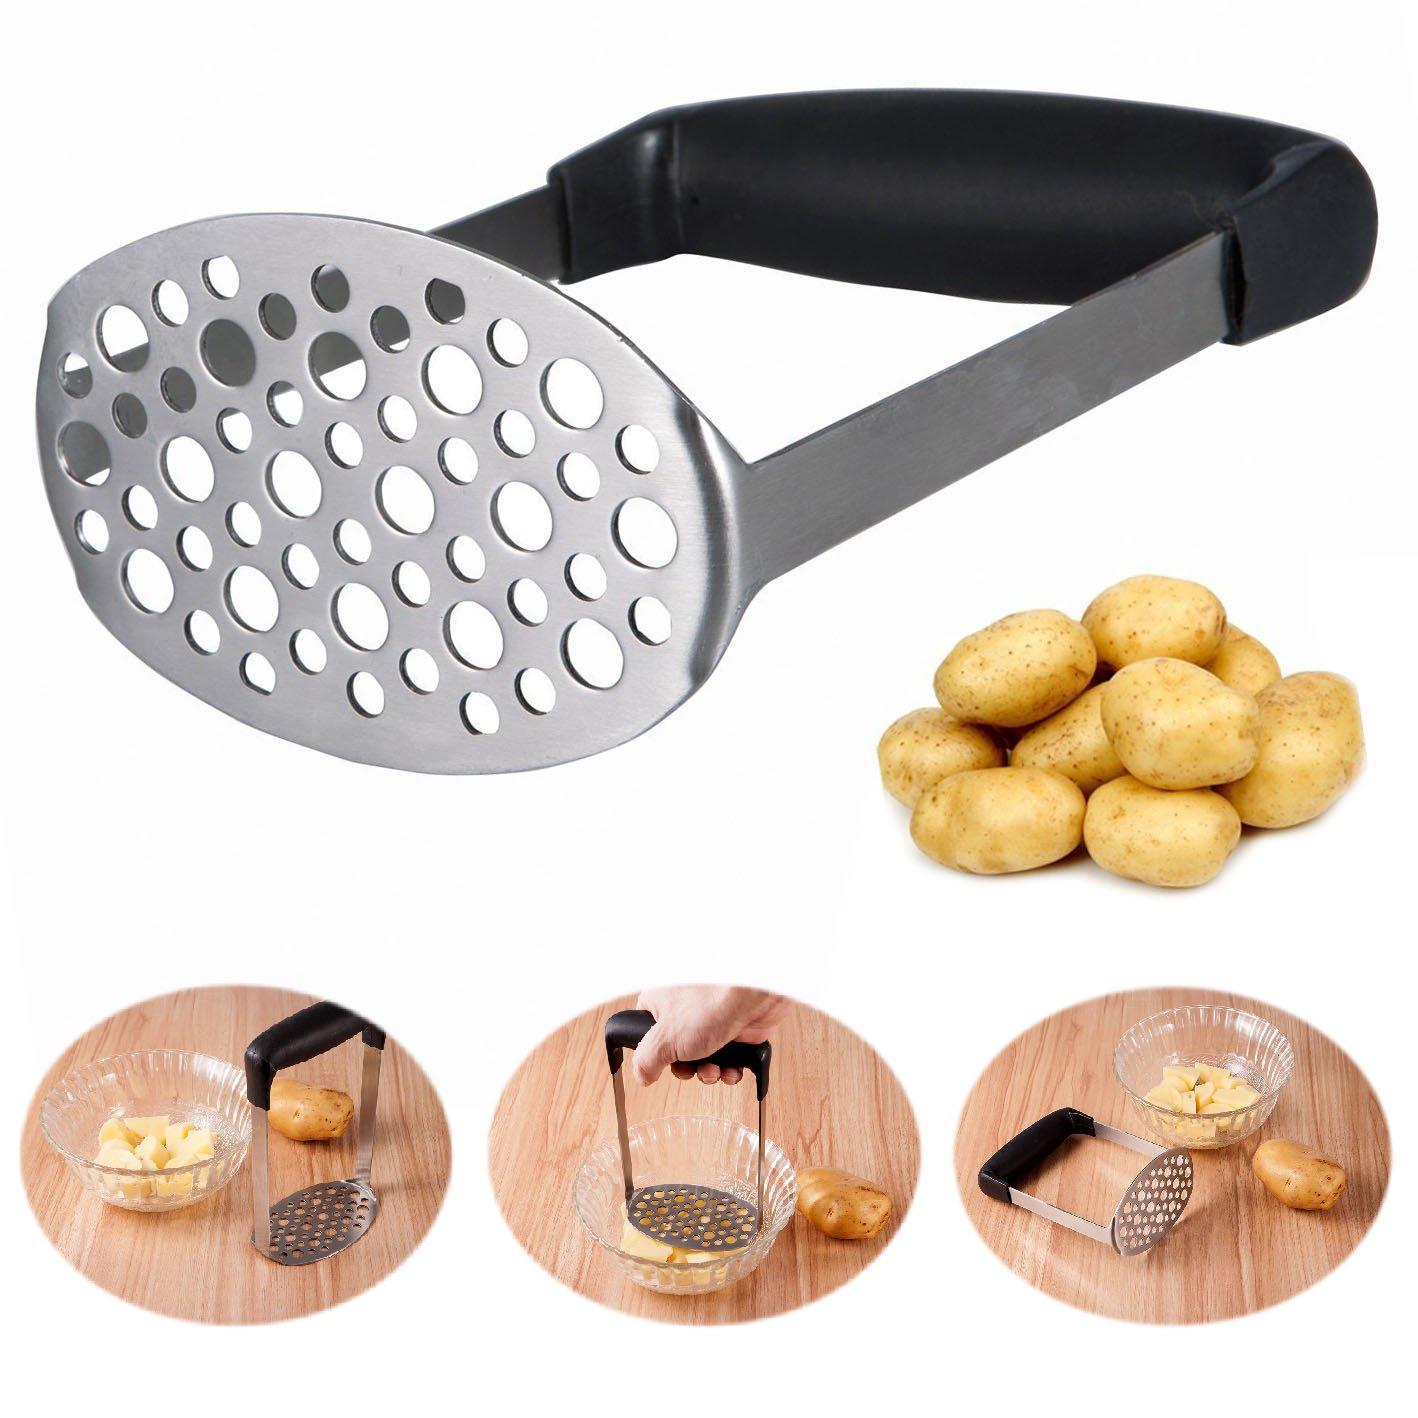 Itian Stainless Steel Potato Masher Potato Press Designed for Delicate Potato Mud